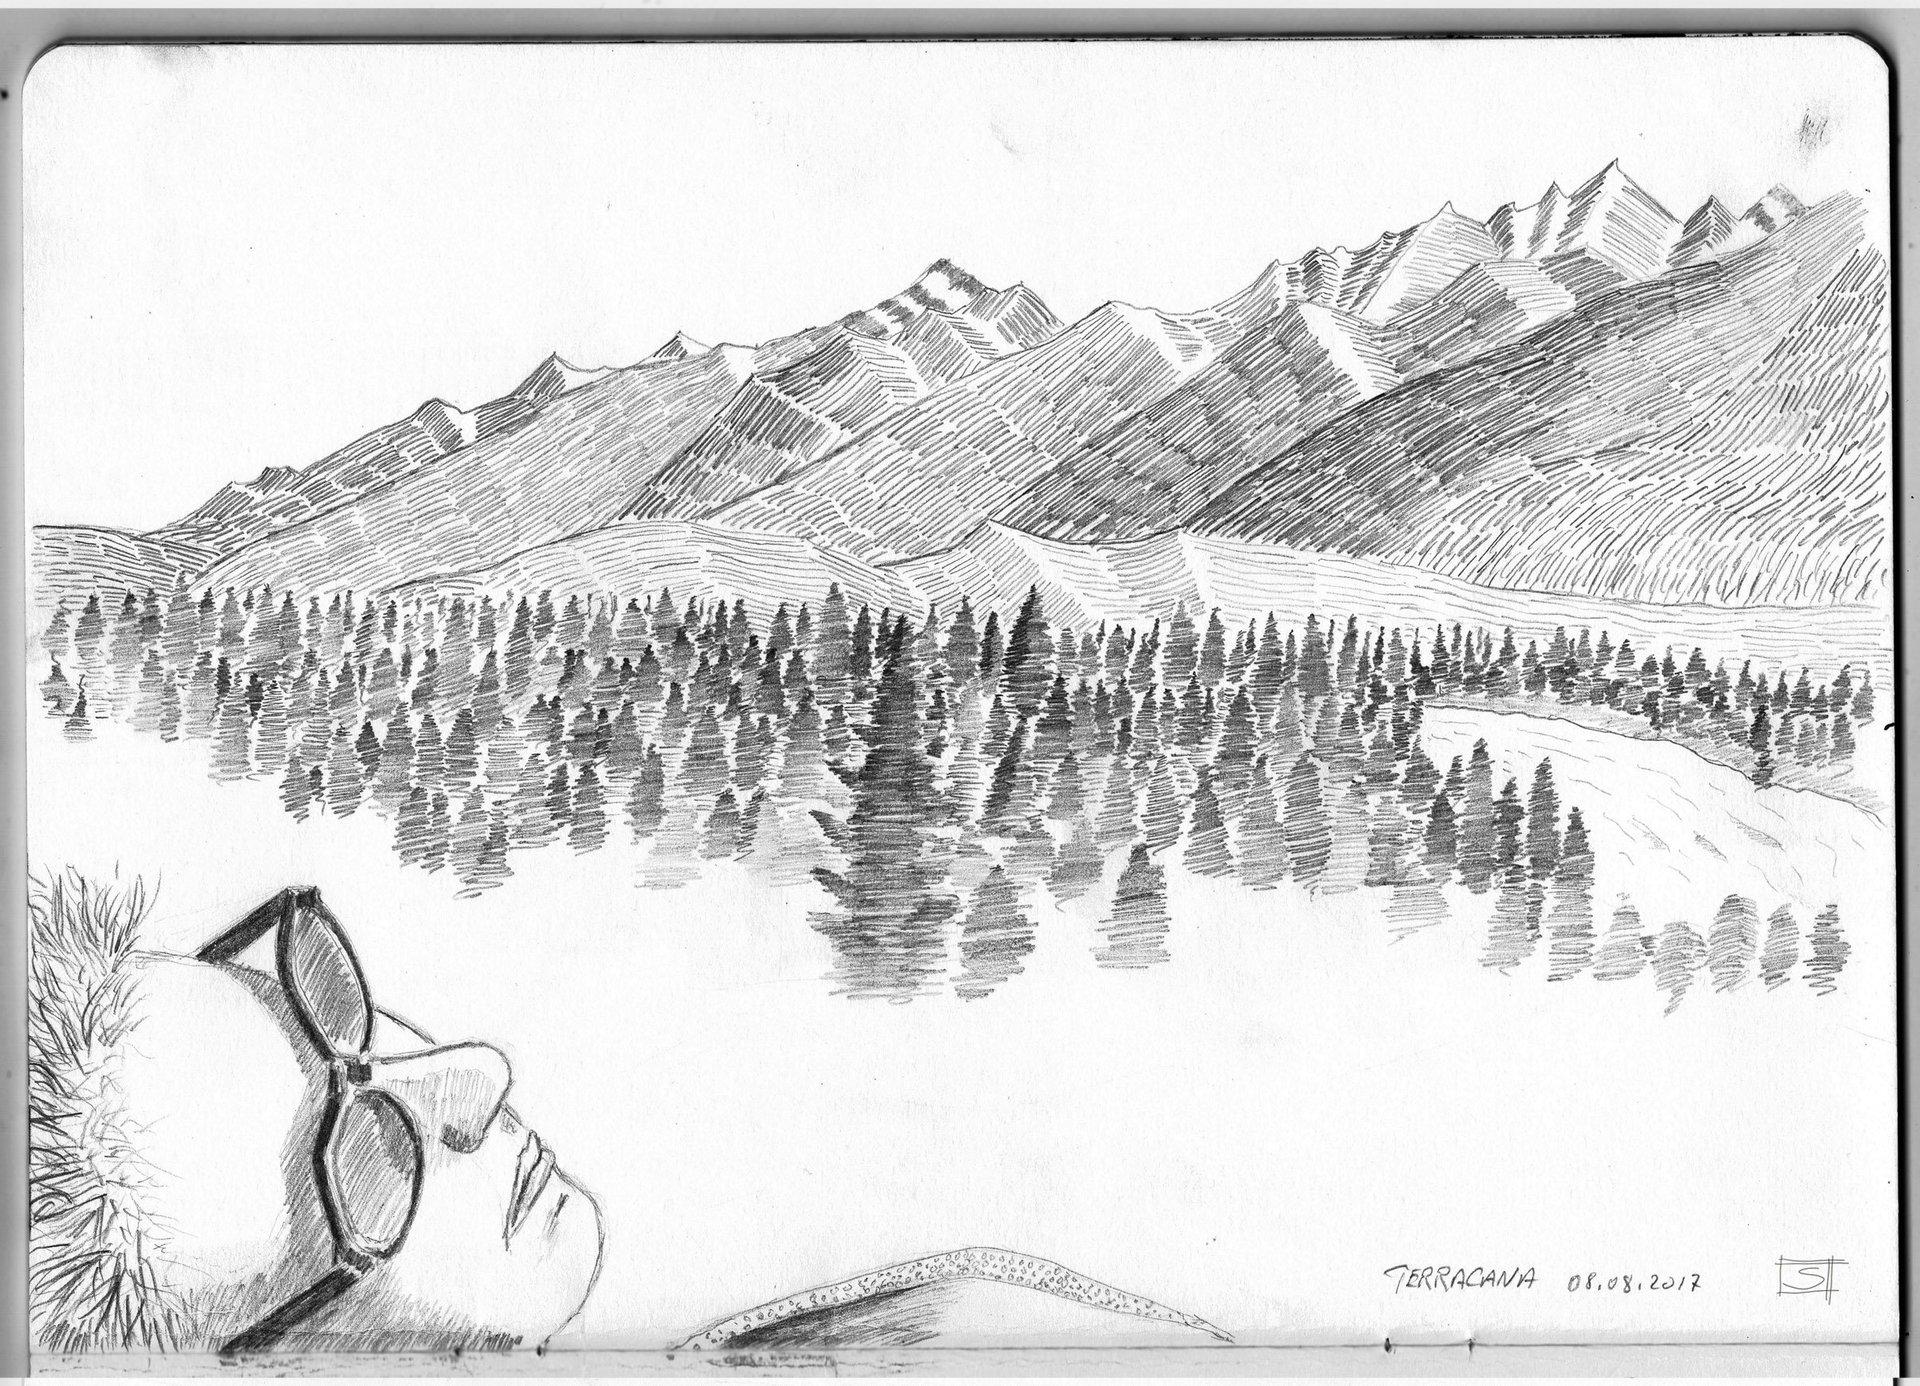 Sebastiano Toma sketches of Canada - Terracana